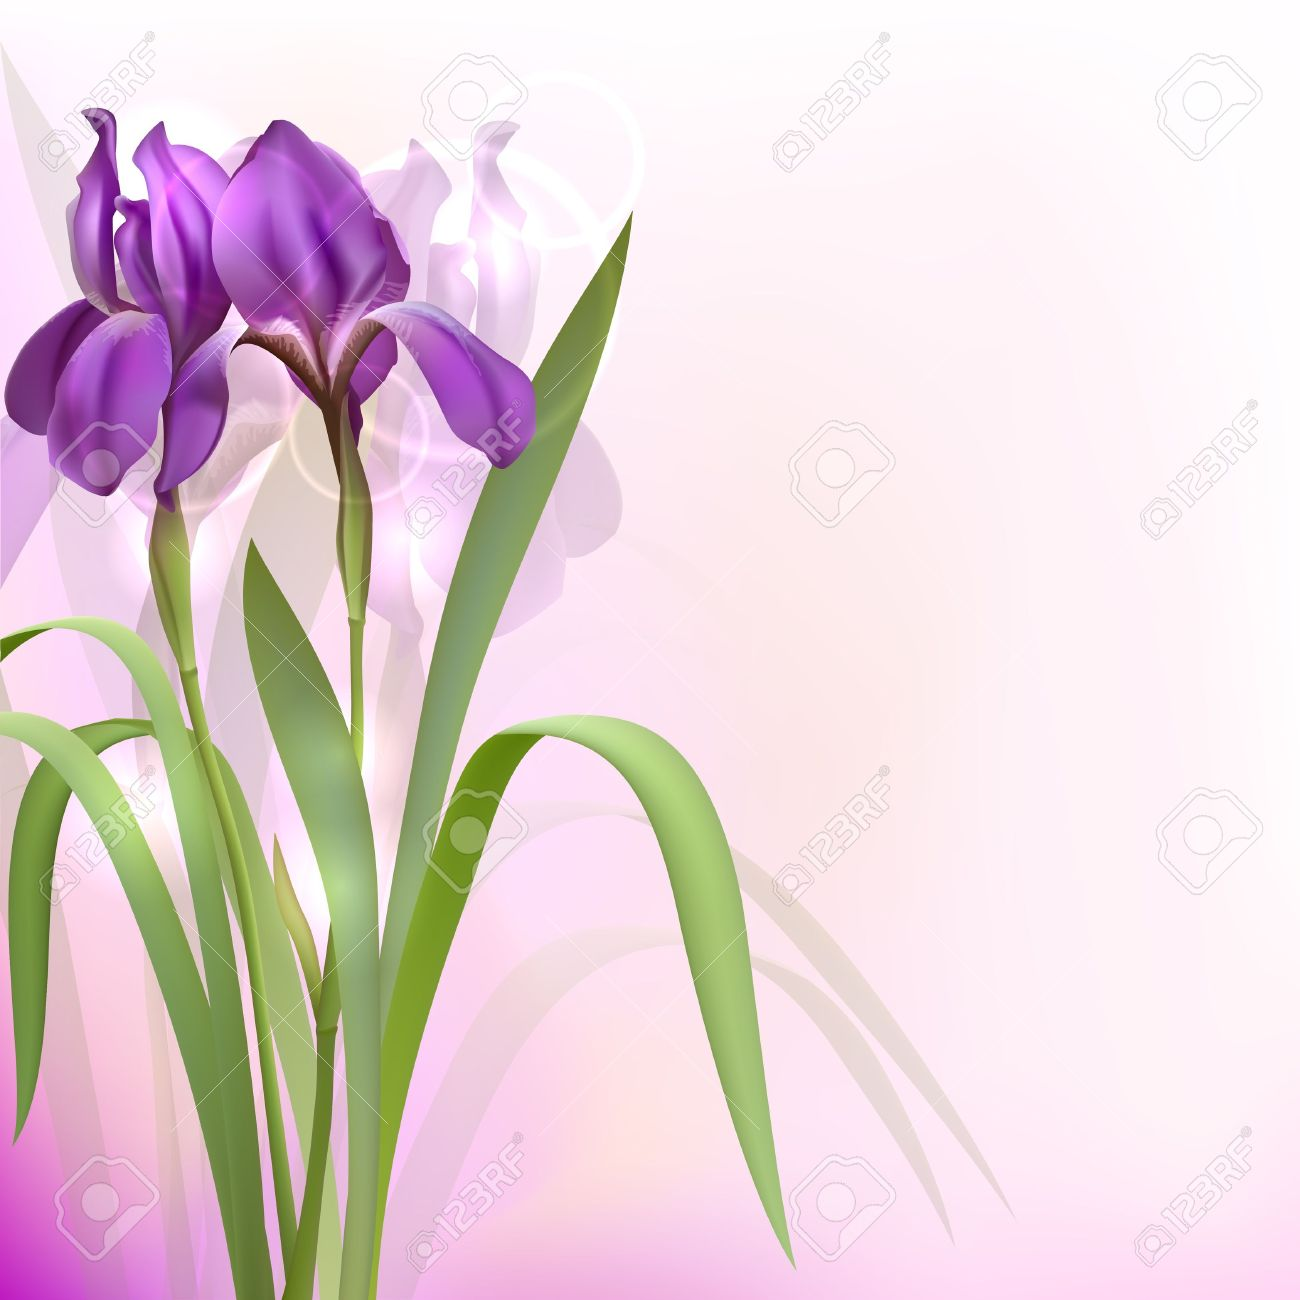 Iris clipart violet Clipart Iris iris #1 flower